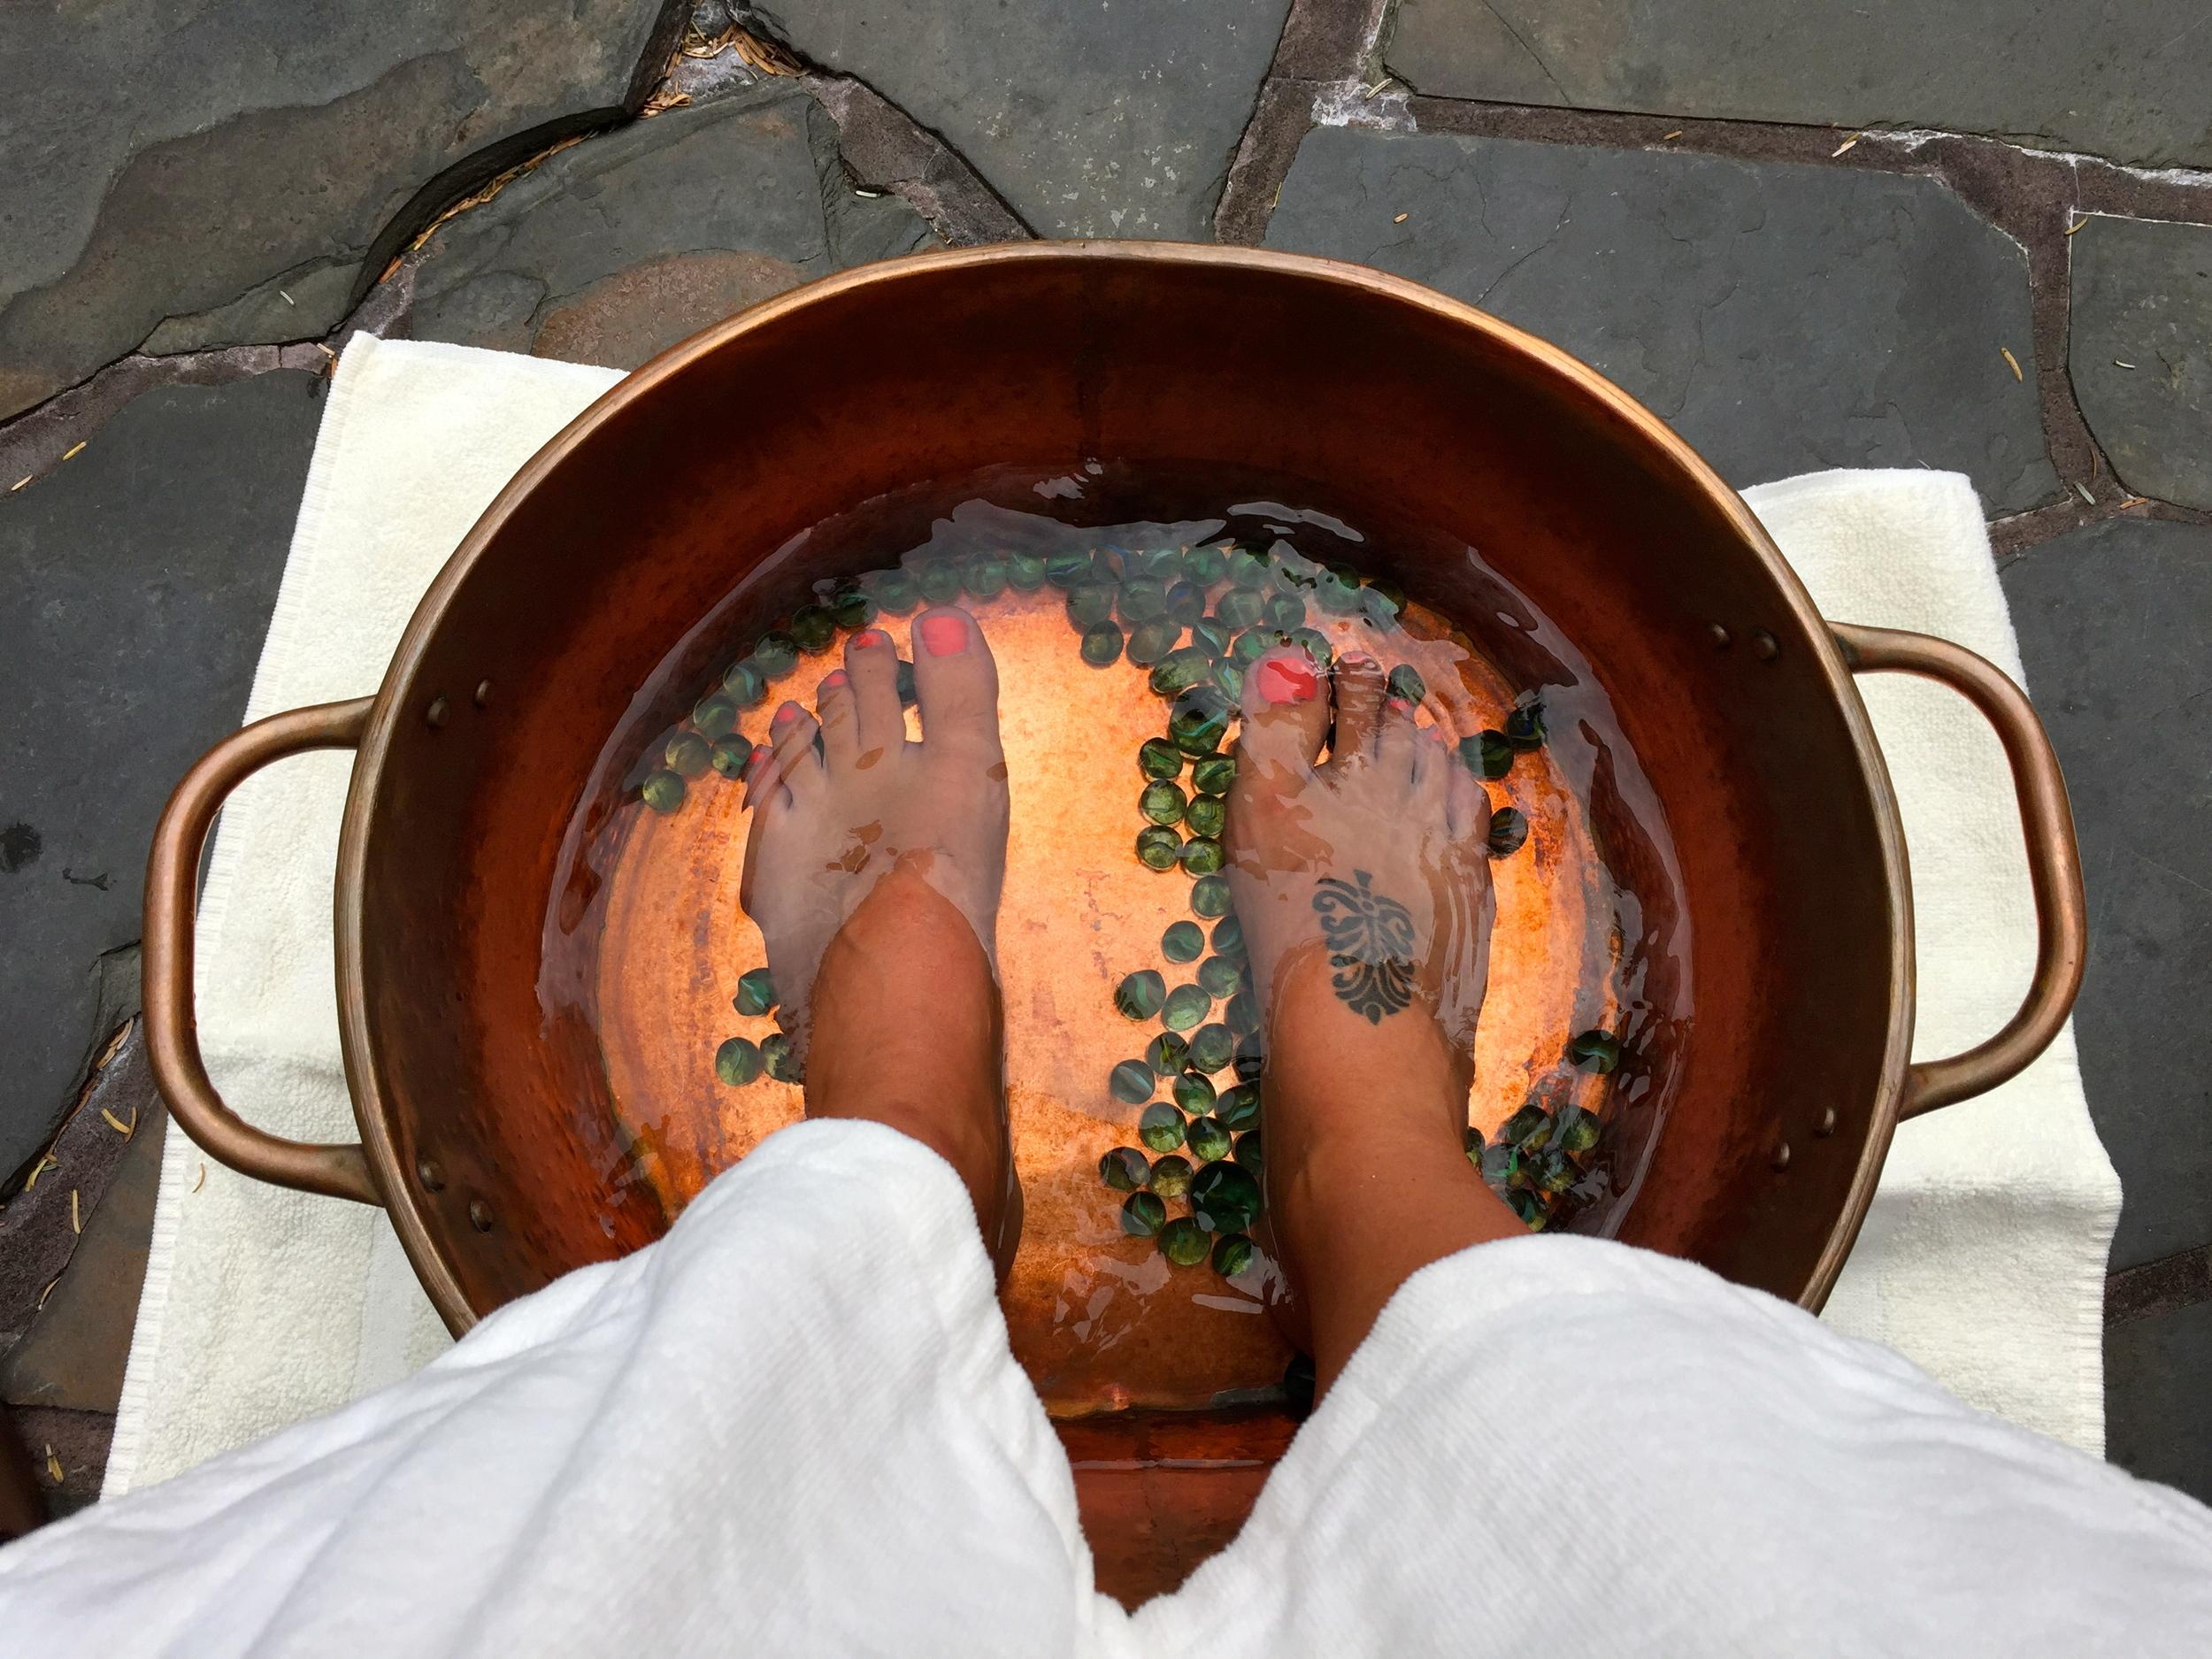 A relaxing start to any treatment. Ancient Cedars Spa, Wickaninnish Inn, Tofino, BC, Canada.